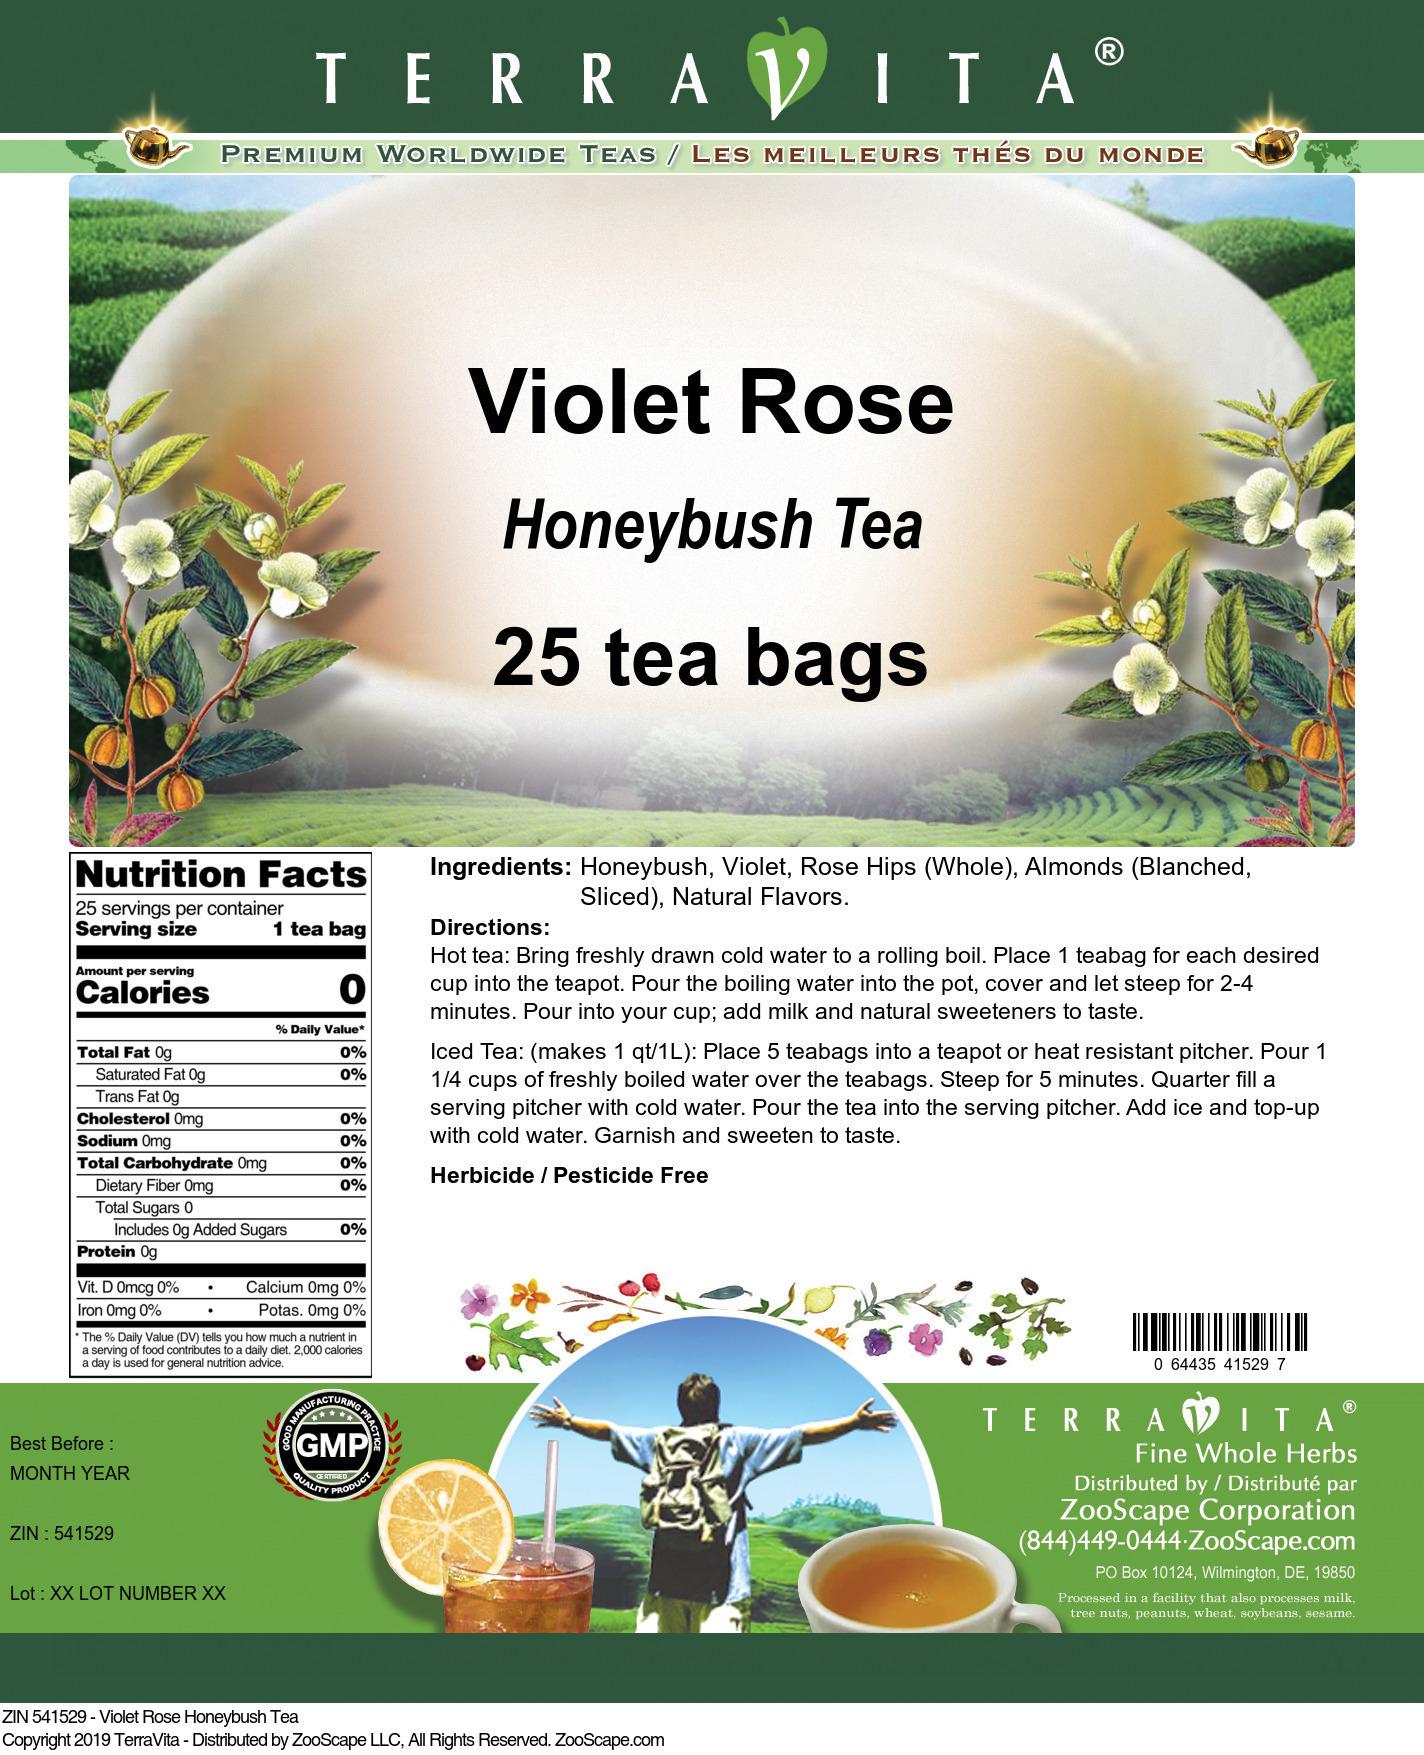 Violet Rose Honeybush Tea